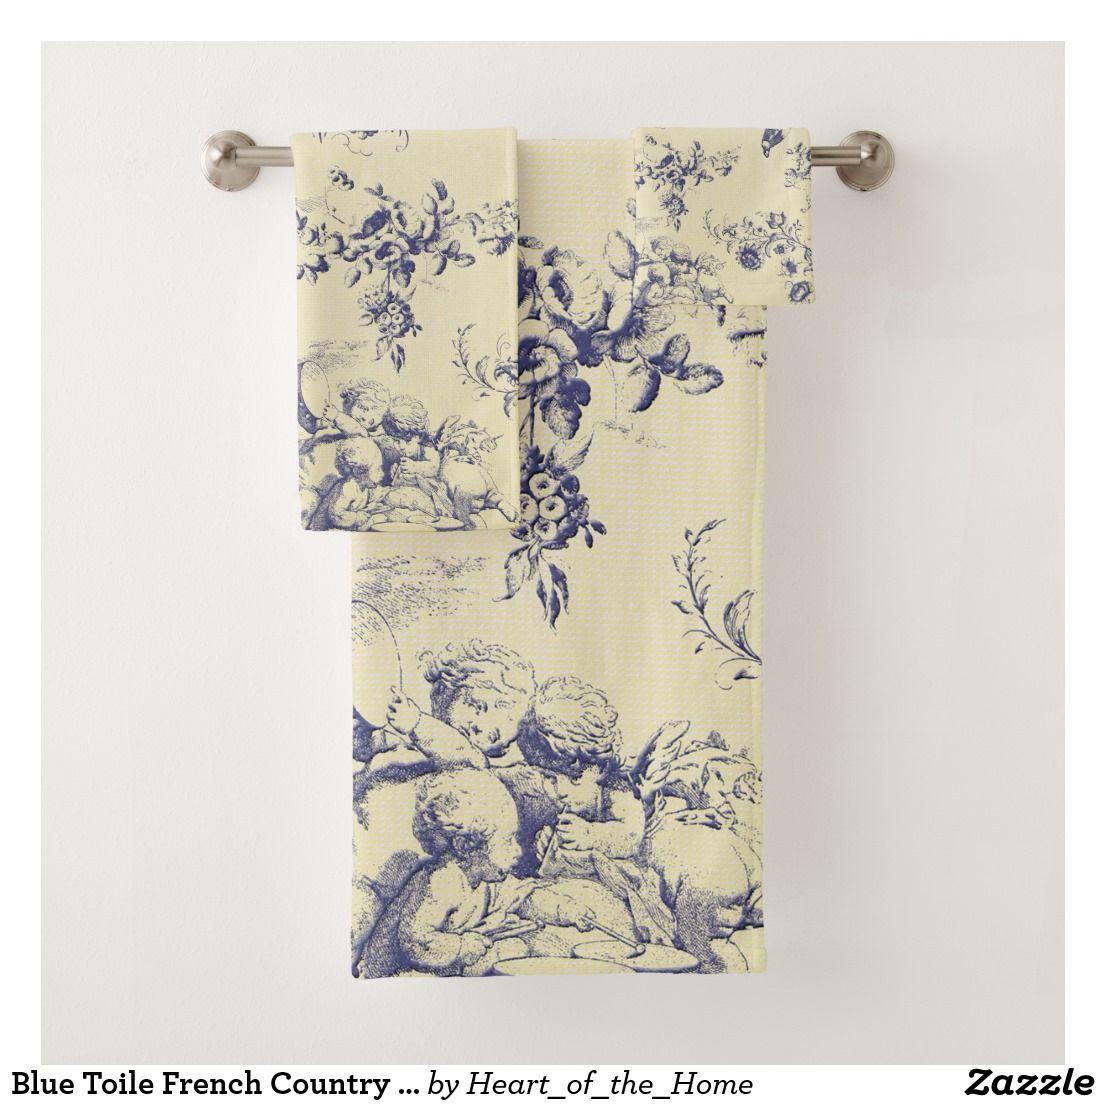 Blue Toile French Country Cherub Pattern Bath Towel Set Zazzle Com Patterned Bath Towels Blue Toile French Country Bathroom